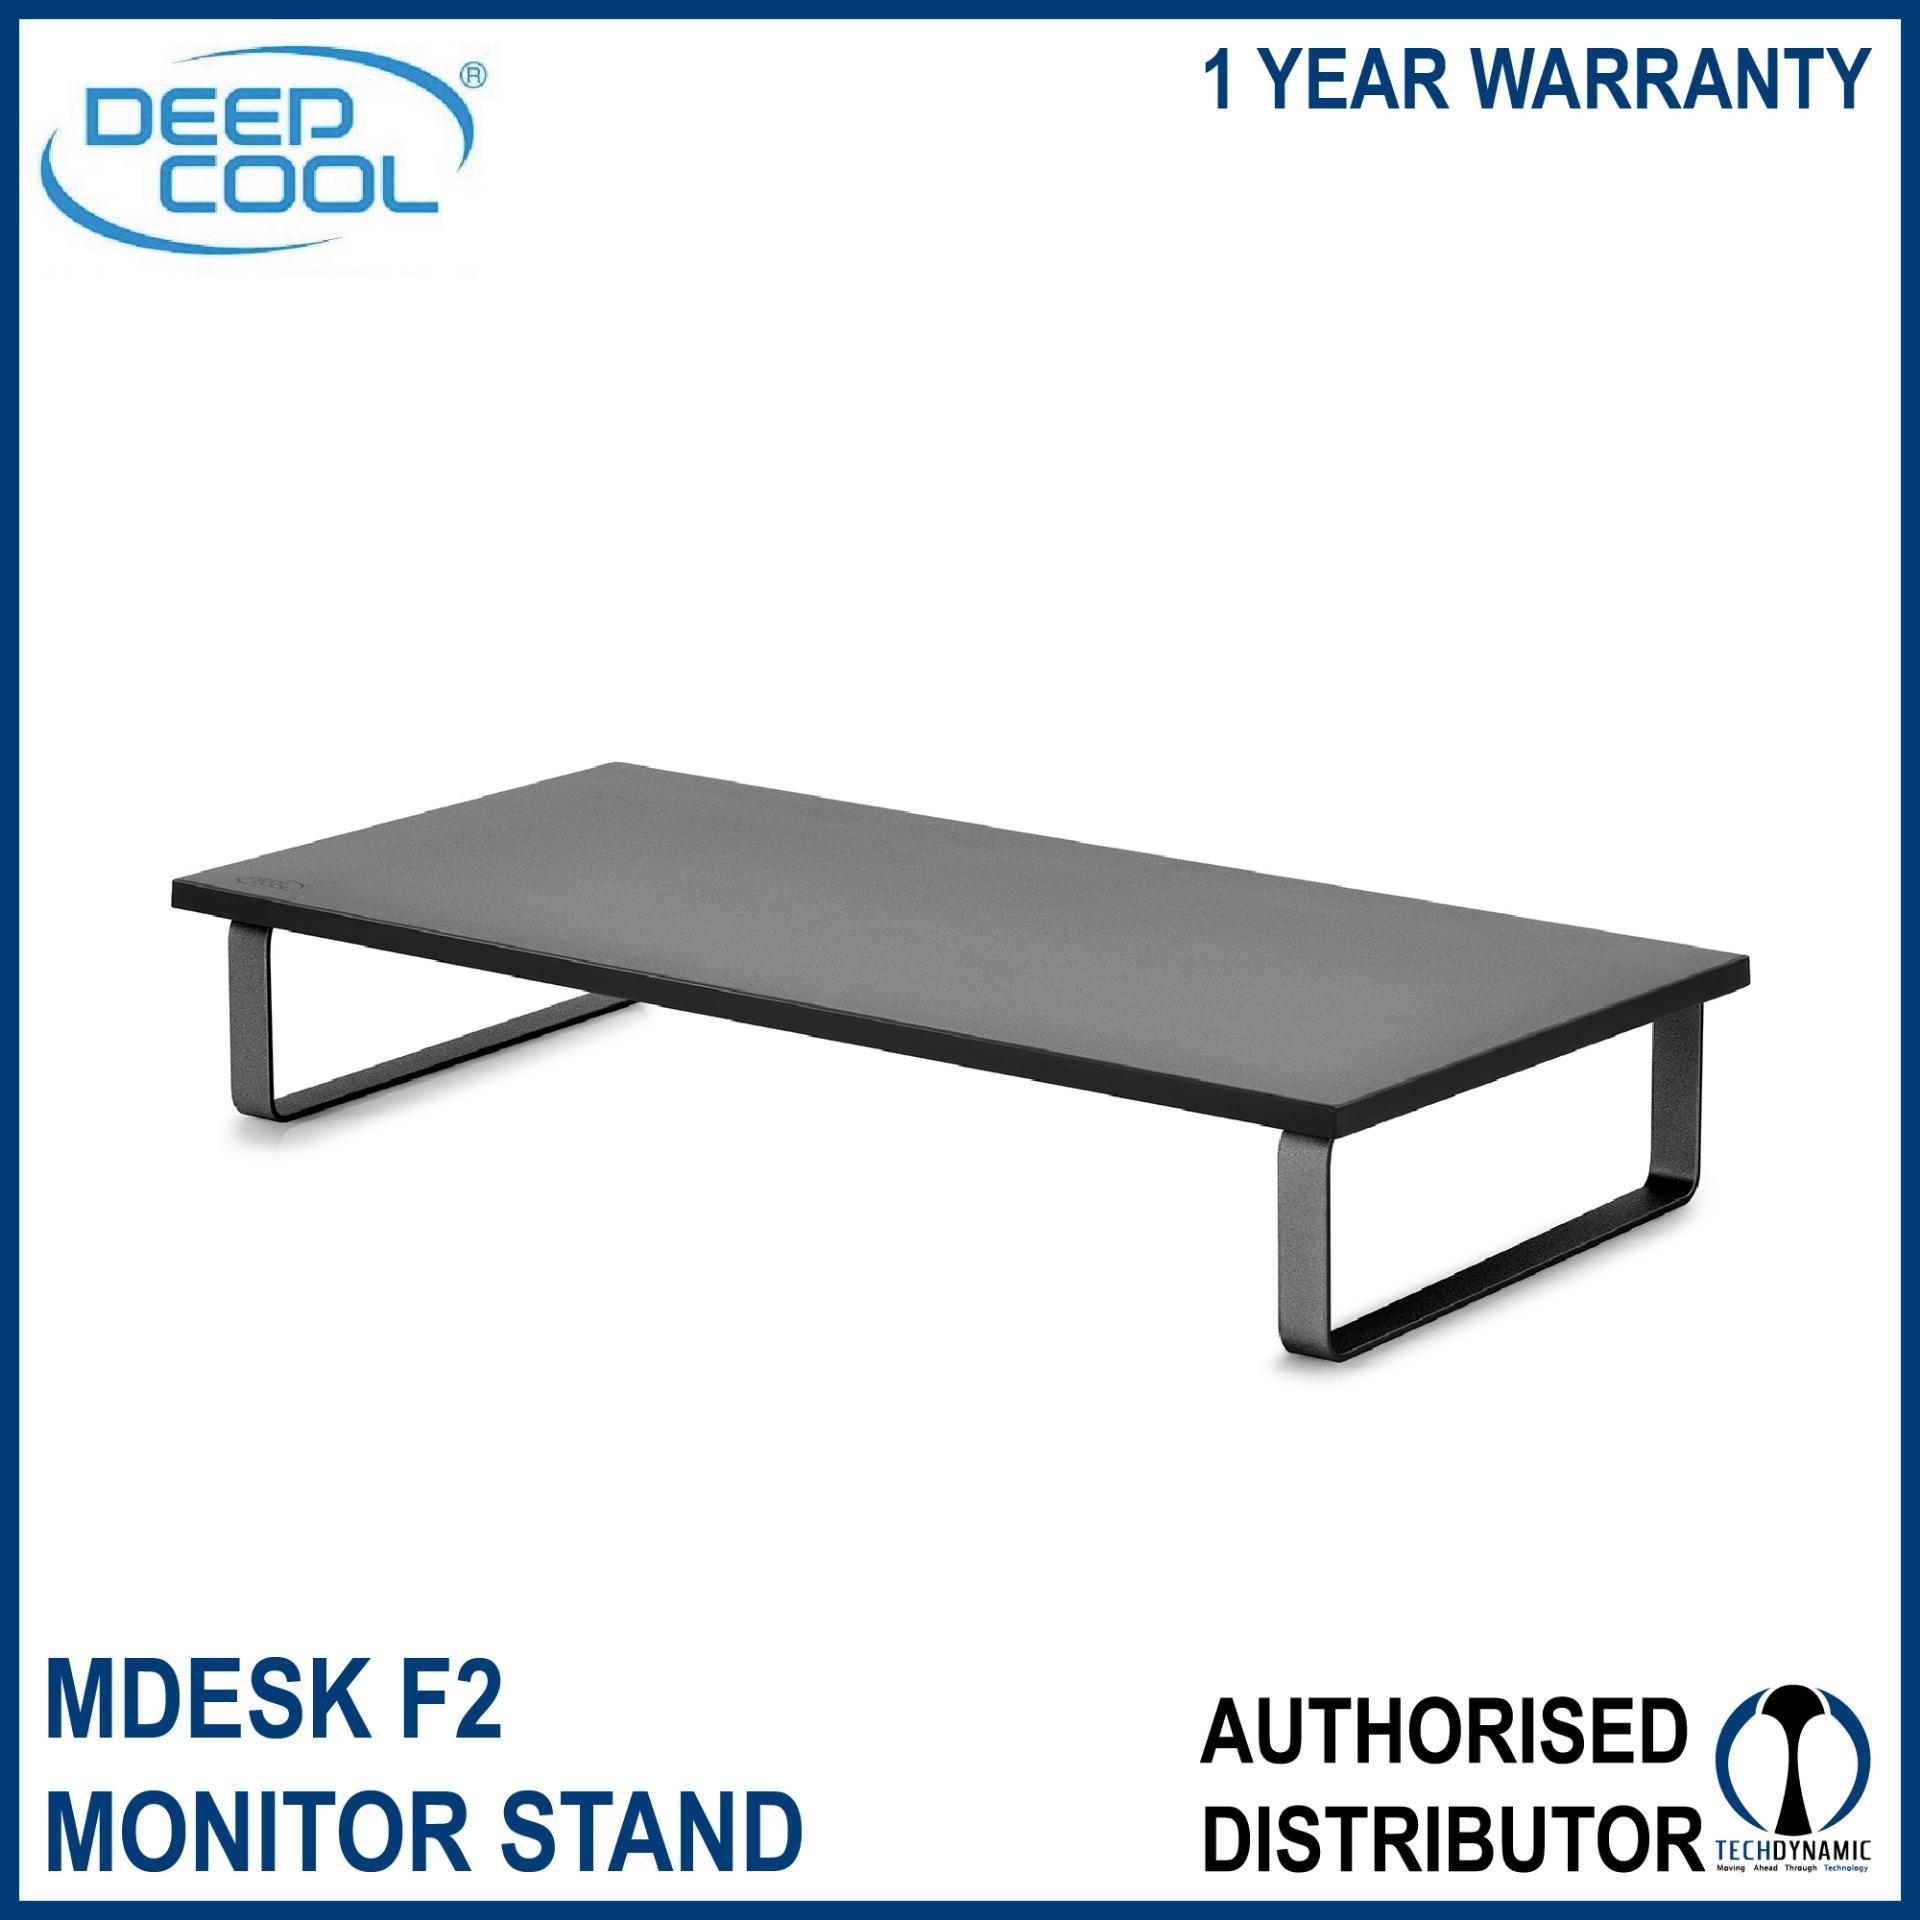 Deepcool MDESK F2 Monitor Stand